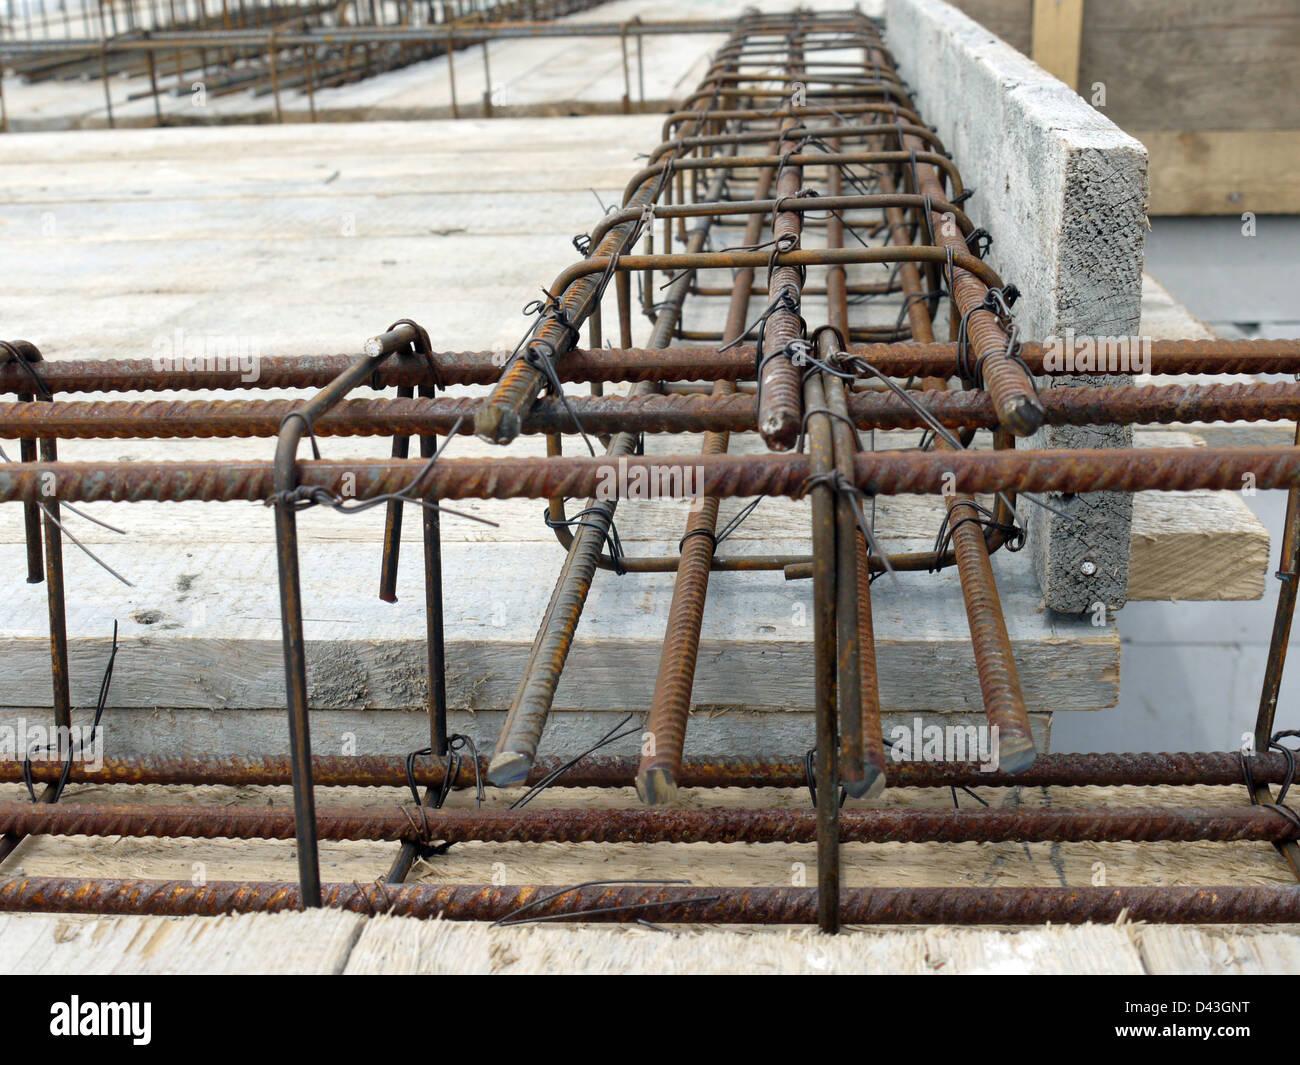 Steel Concrete Slab : Closeup shot of steel bar reinforcement used for